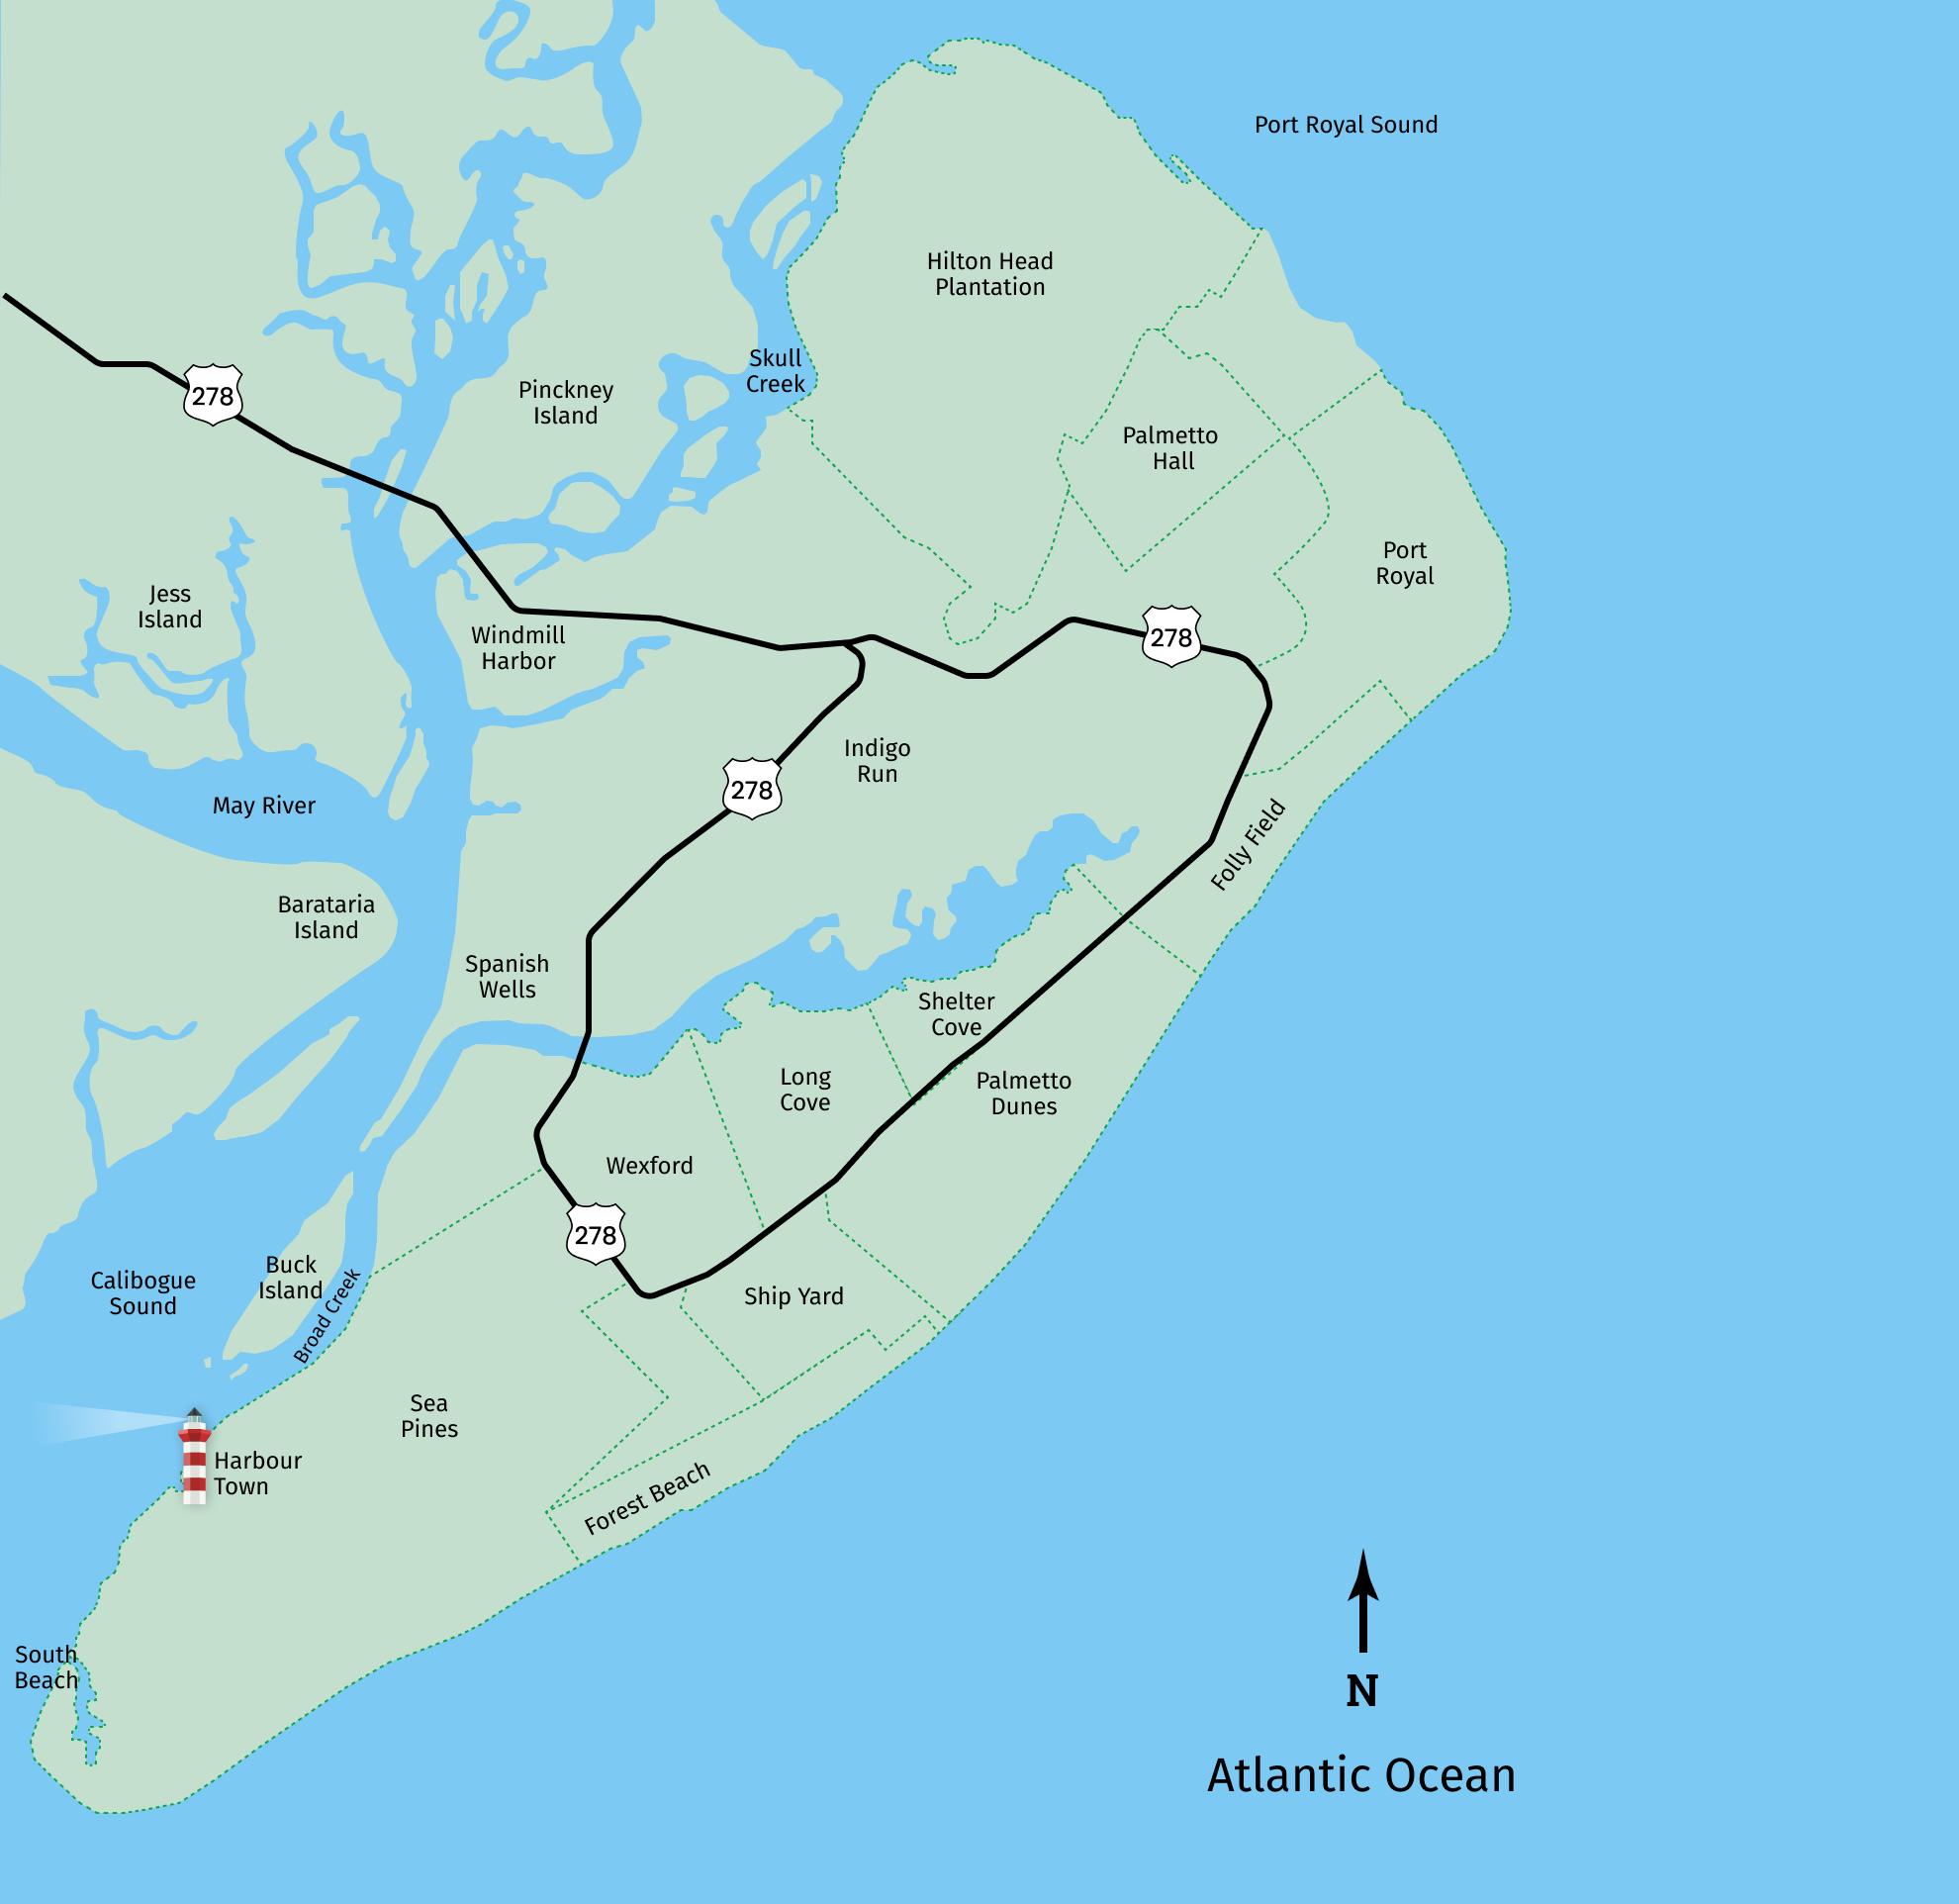 Hilton Head bike rental map